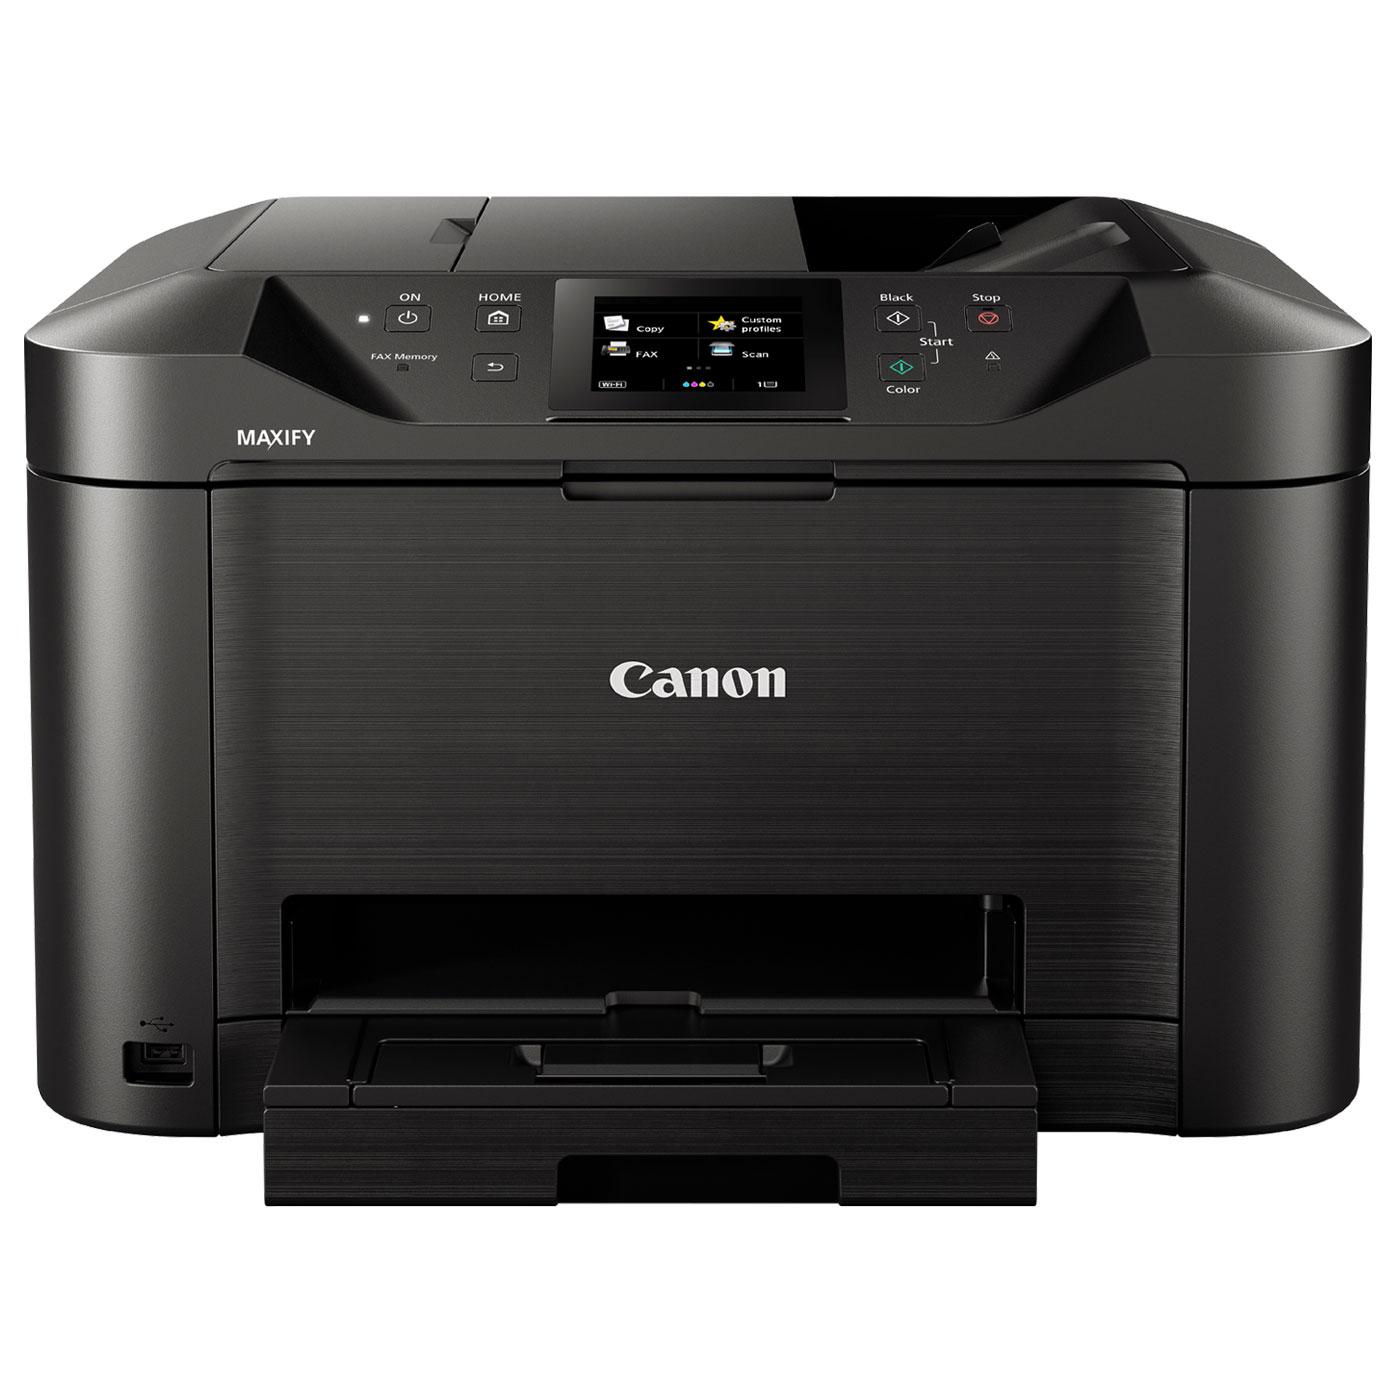 Imprimante multifonction Canon MAXIFY MB5150 - Cybertek.fr - 0